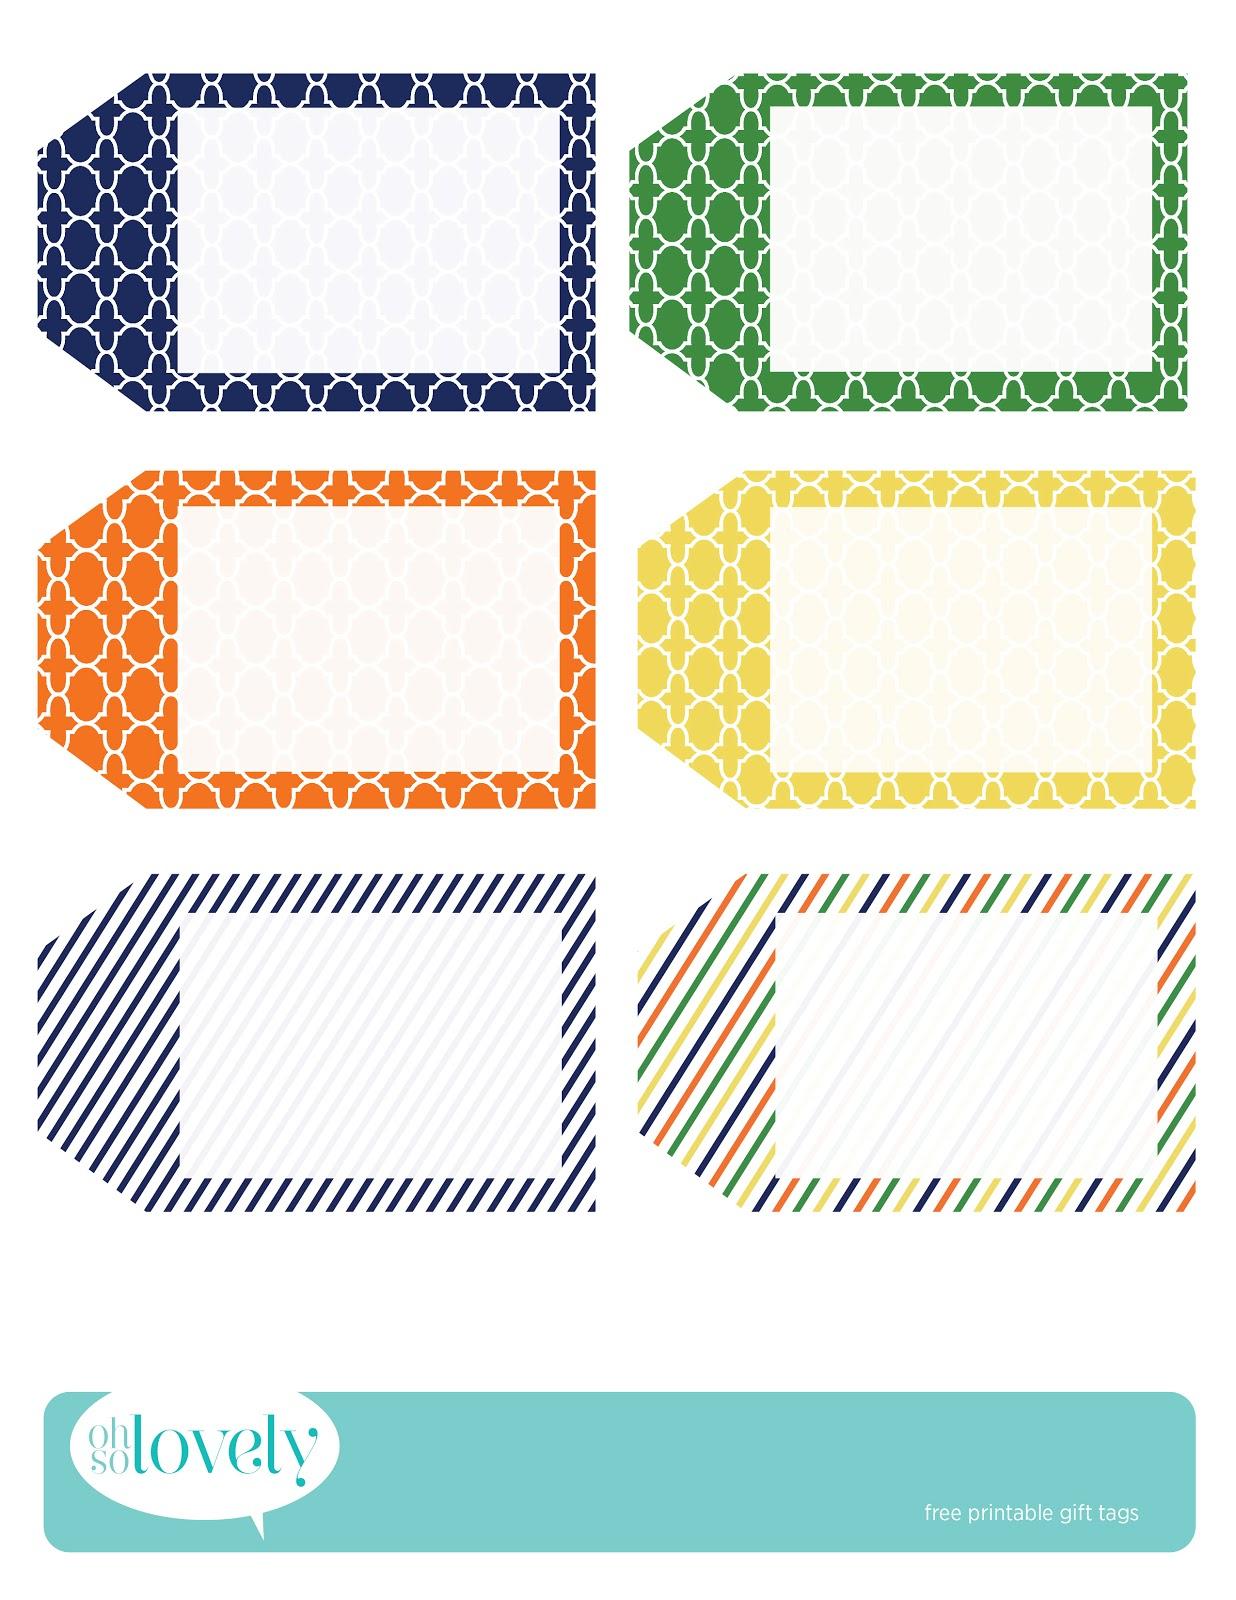 022 Printable Gift Tags Templates Birthday Tag Template ~ Ulyssesroom - Free Printable Thank You Tags Template